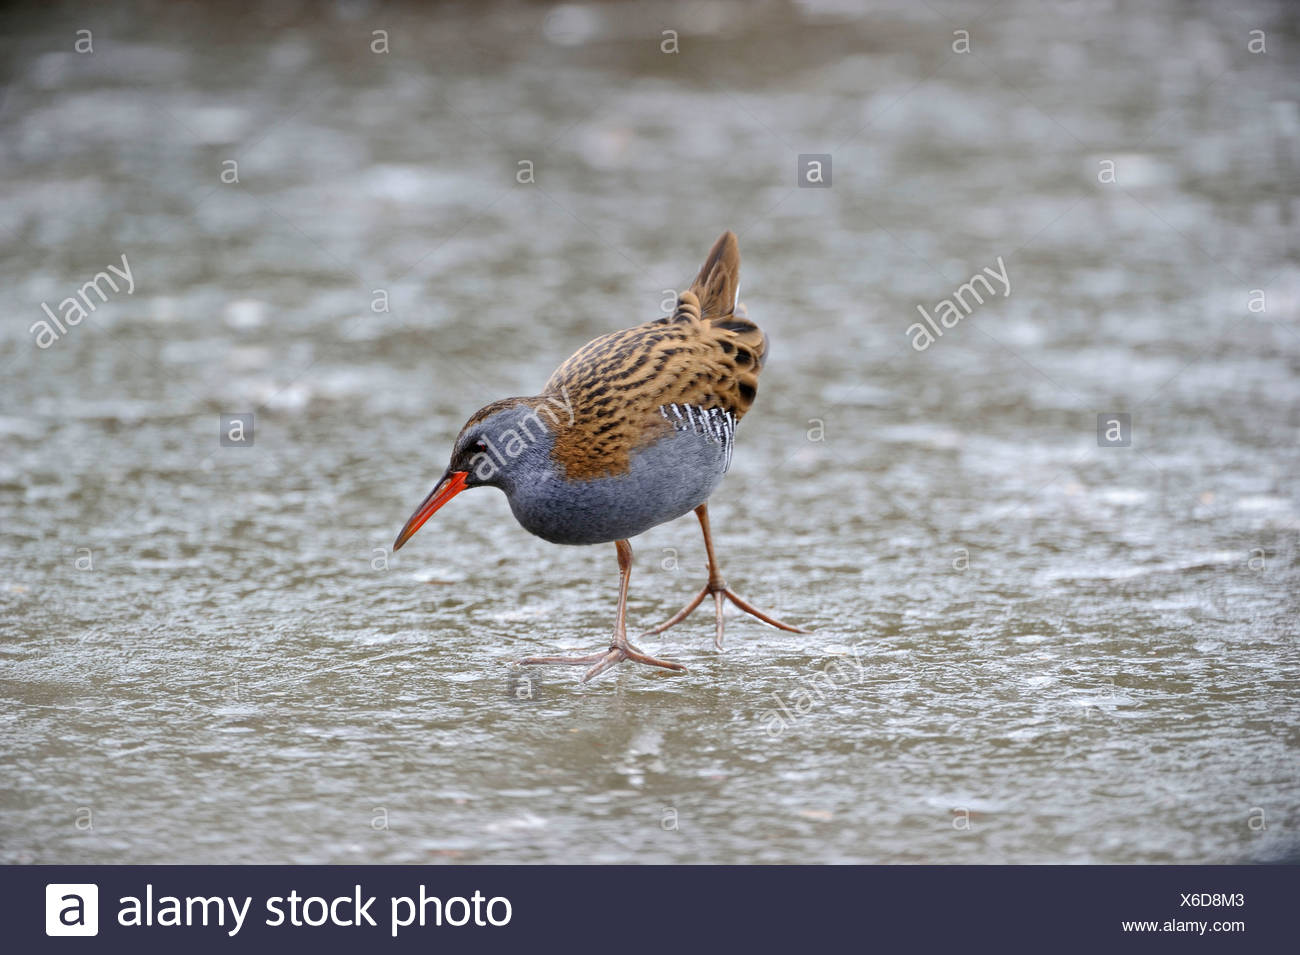 Water Rail (Rallus aquaticus) male feding on icy pool Slimbridge winter - Stock Image